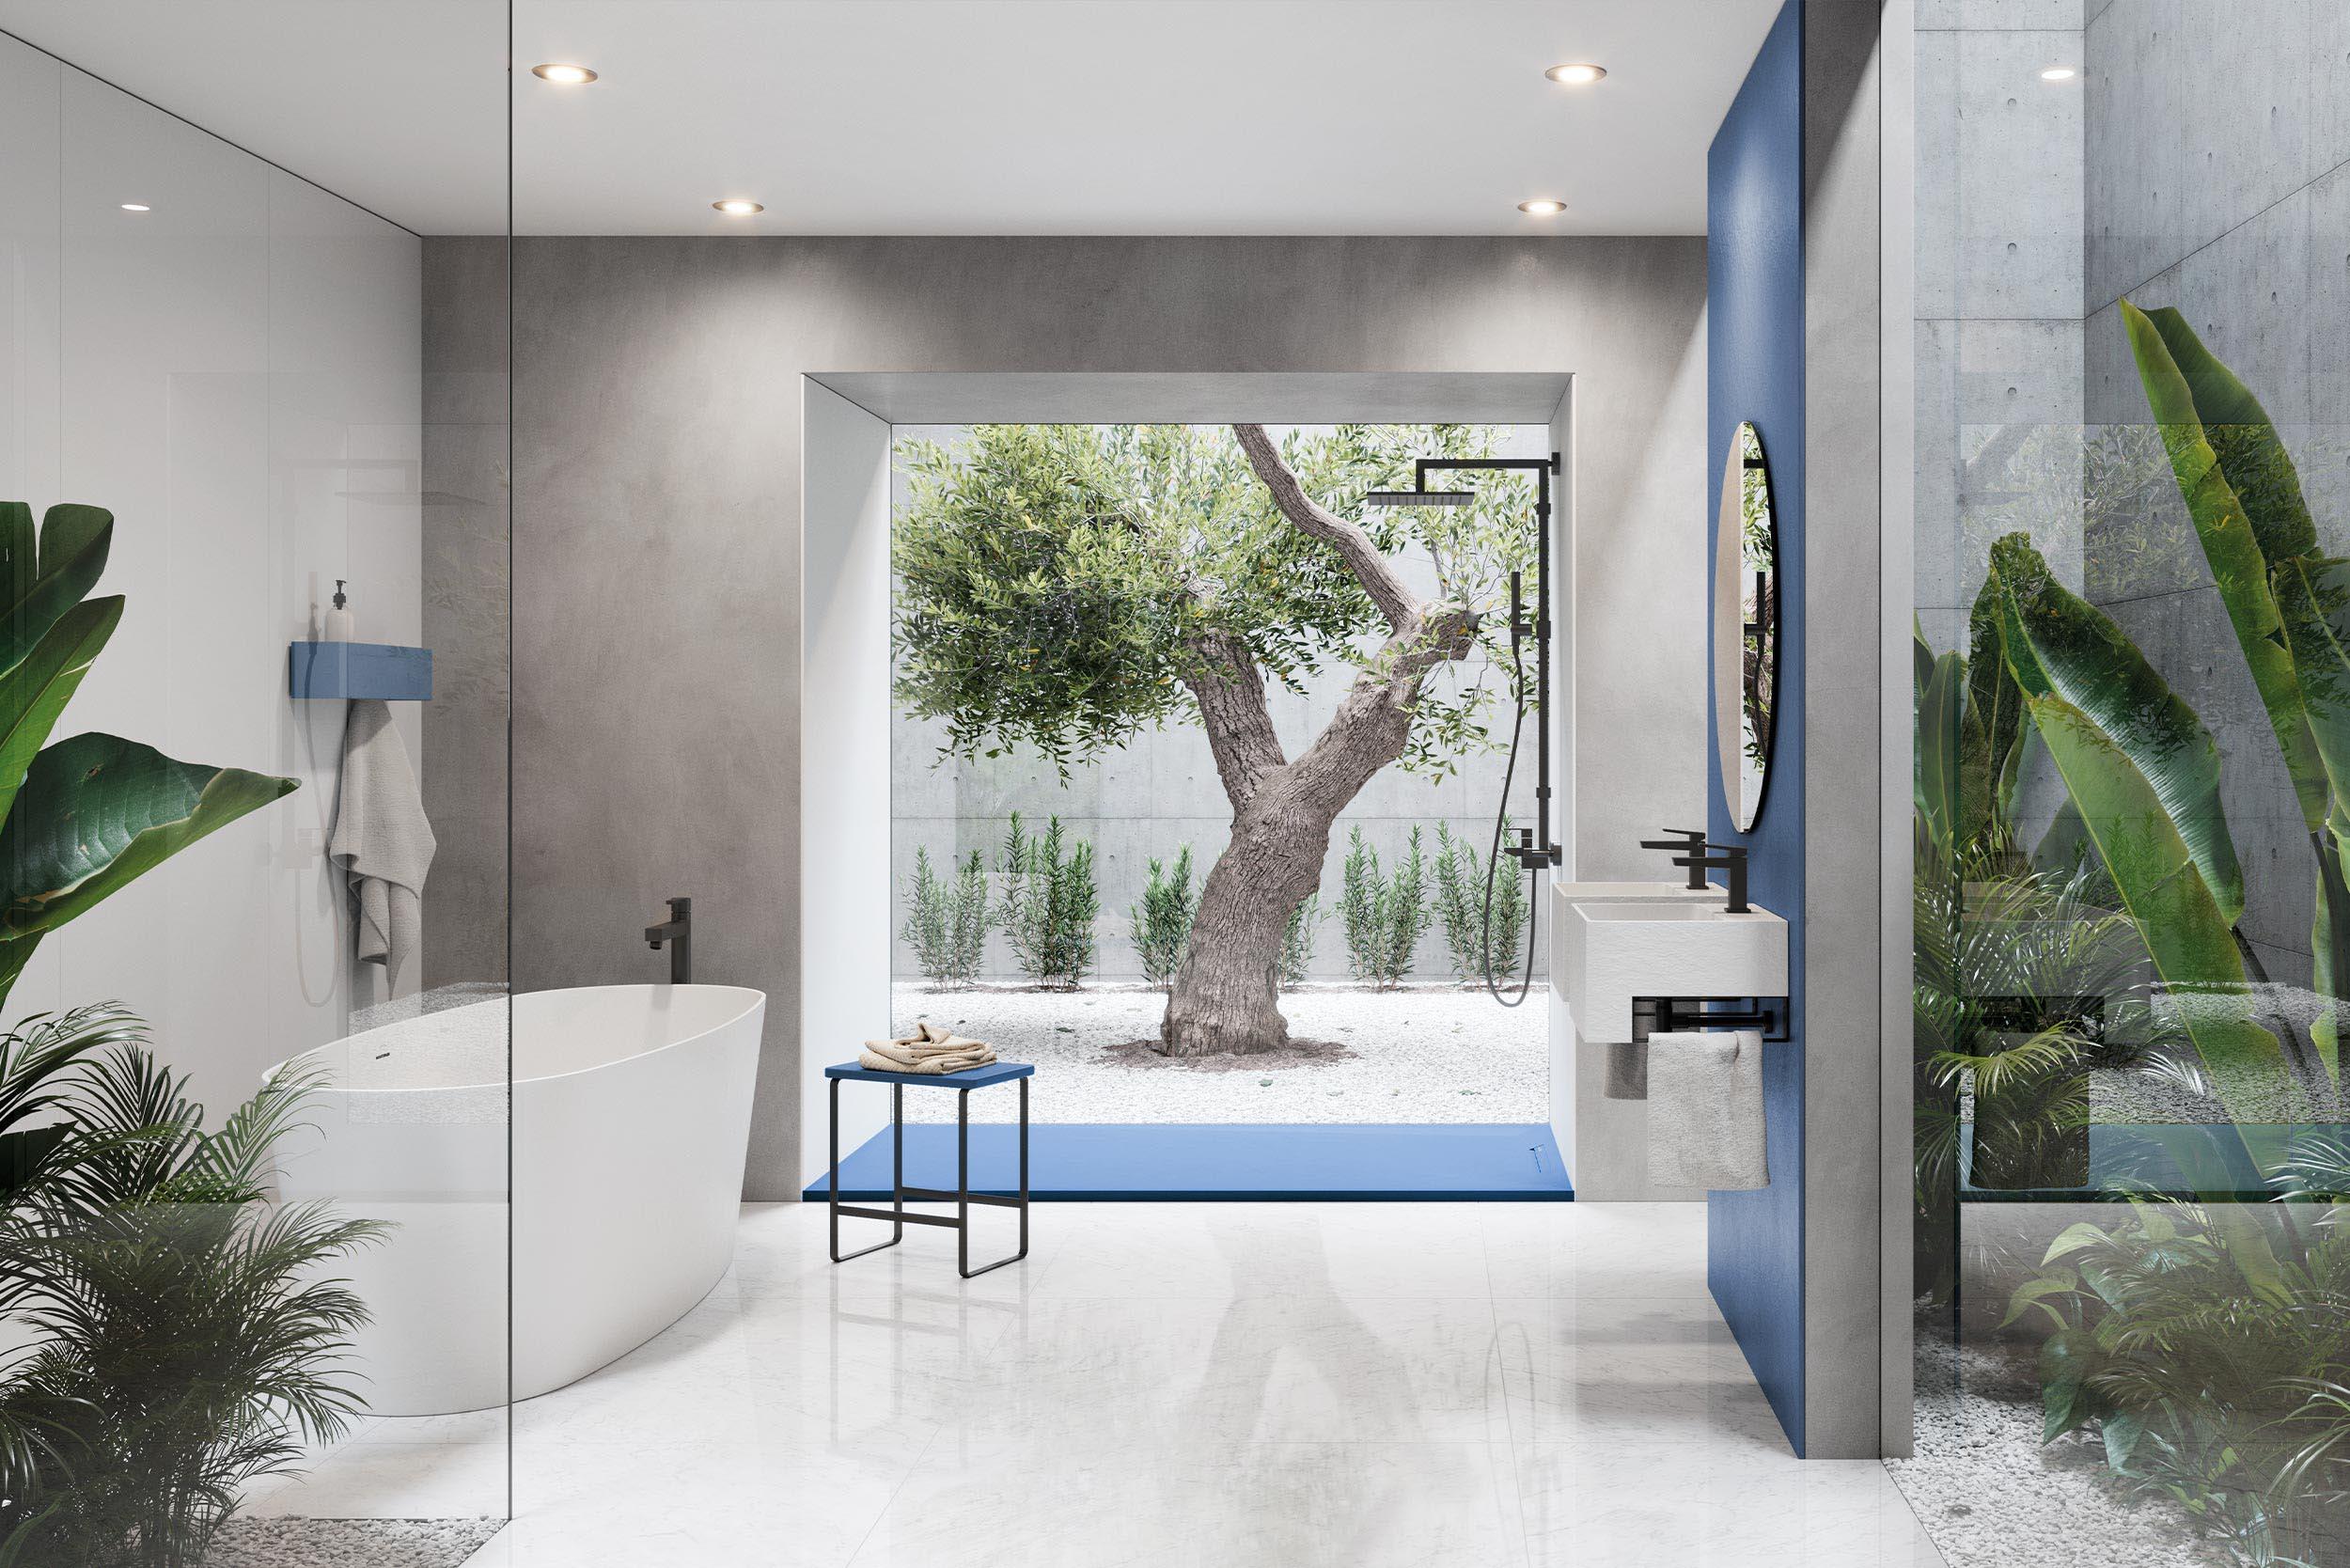 Mediterranean designs in the bathroom